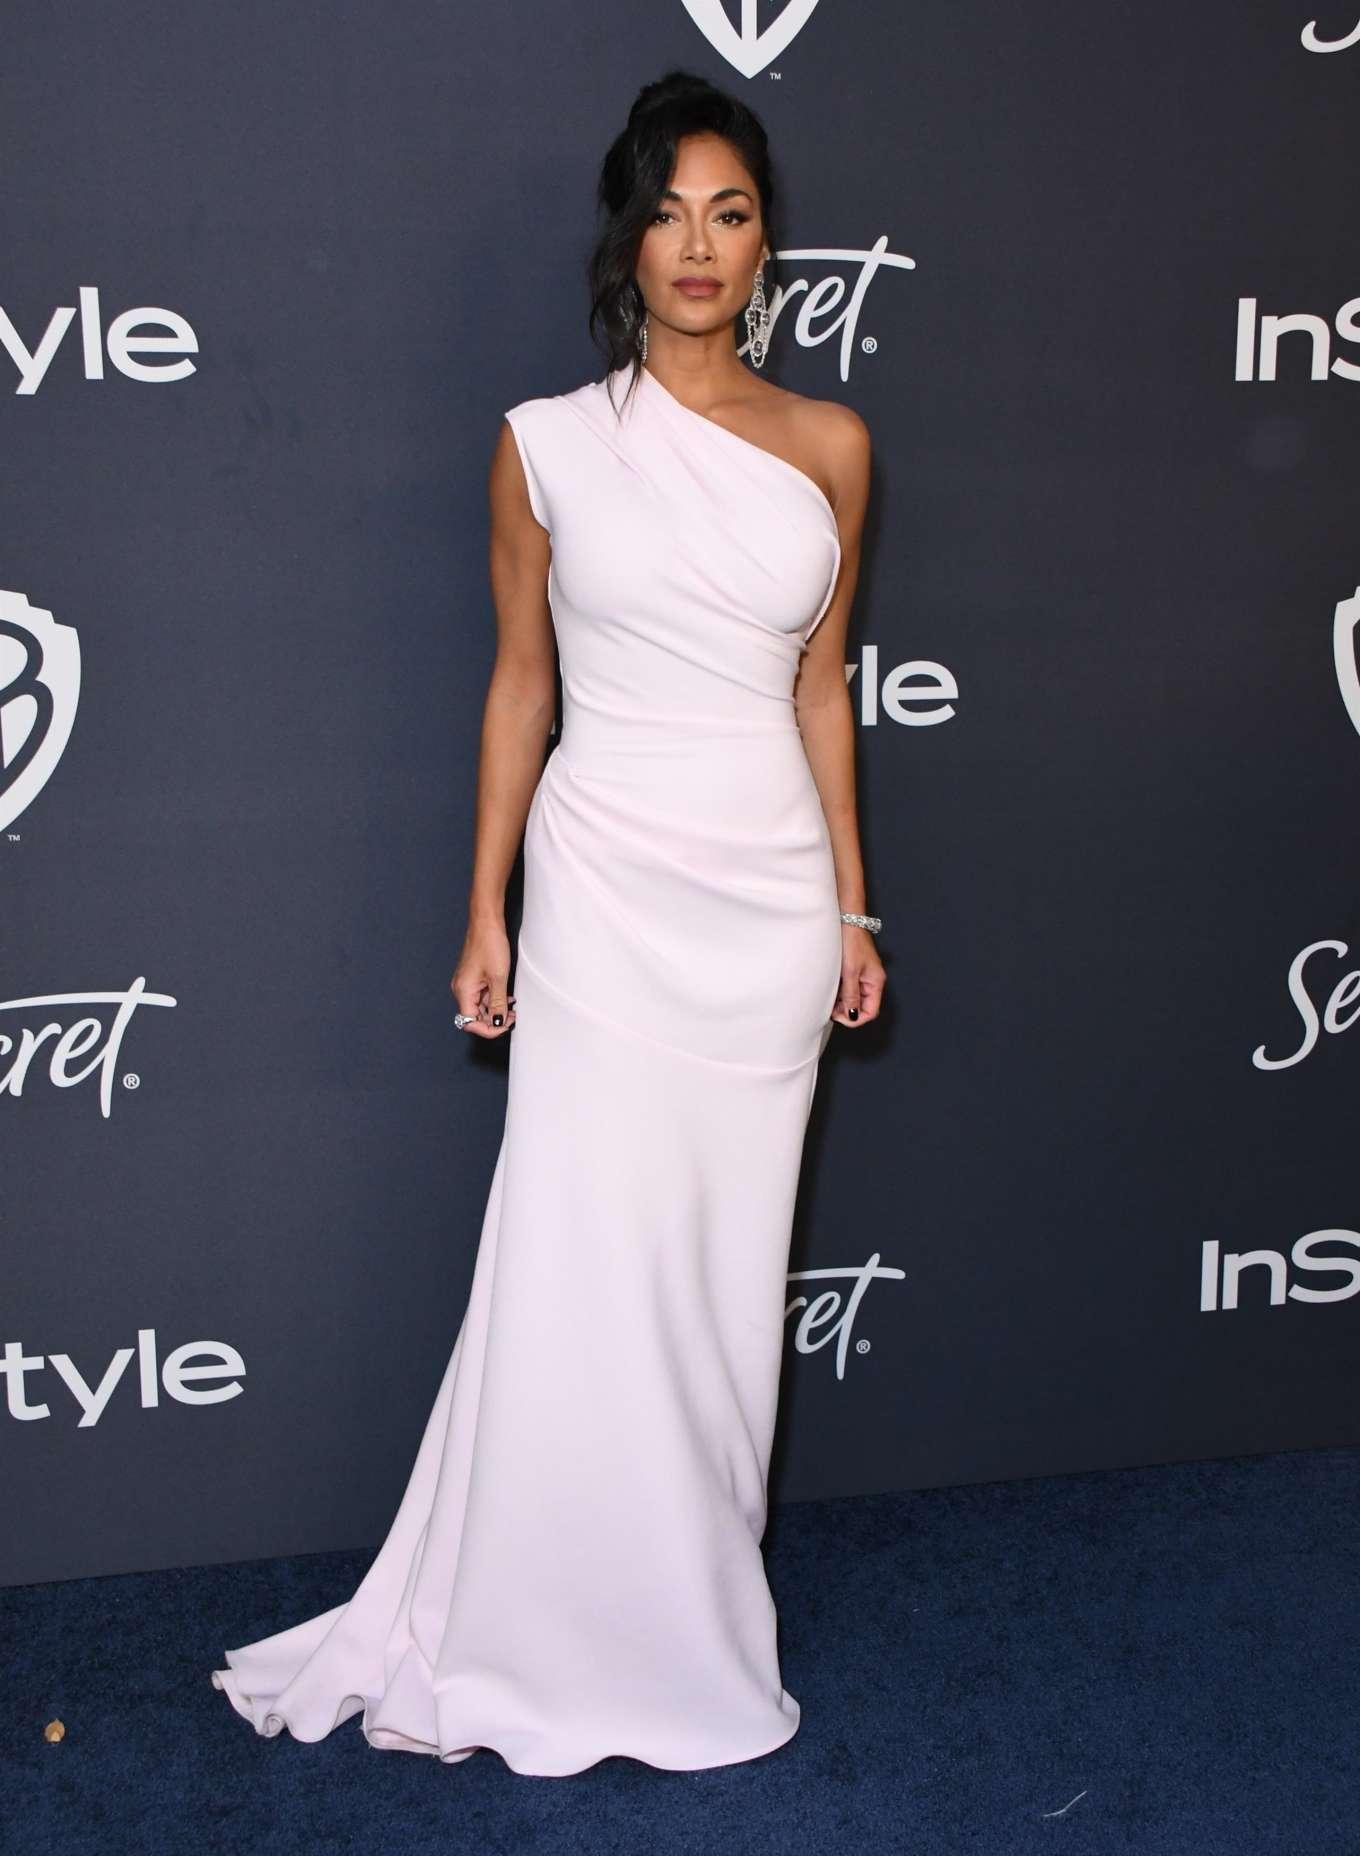 Nicole Scherzinger - 2020 InStyle and Warner Bros Golden Globes Party in Beverly Hills